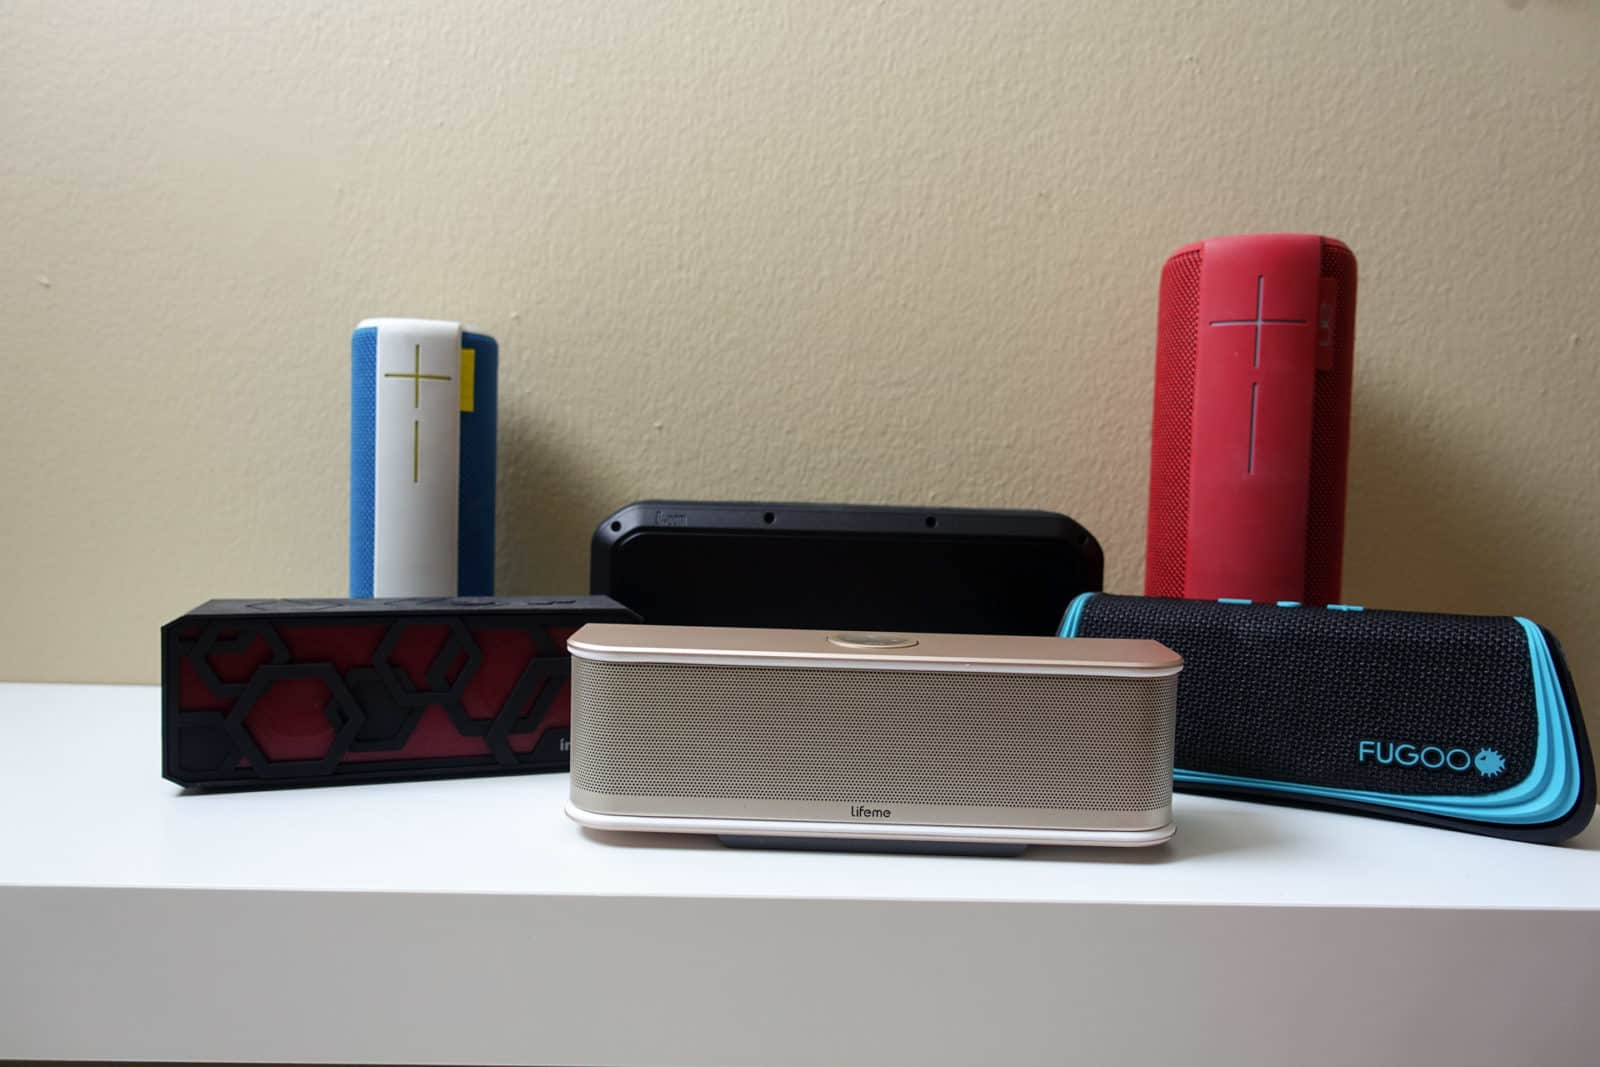 speakers under 10. featured: top 10 best bluetooth speakers under $50 \u2013 oct. 2015